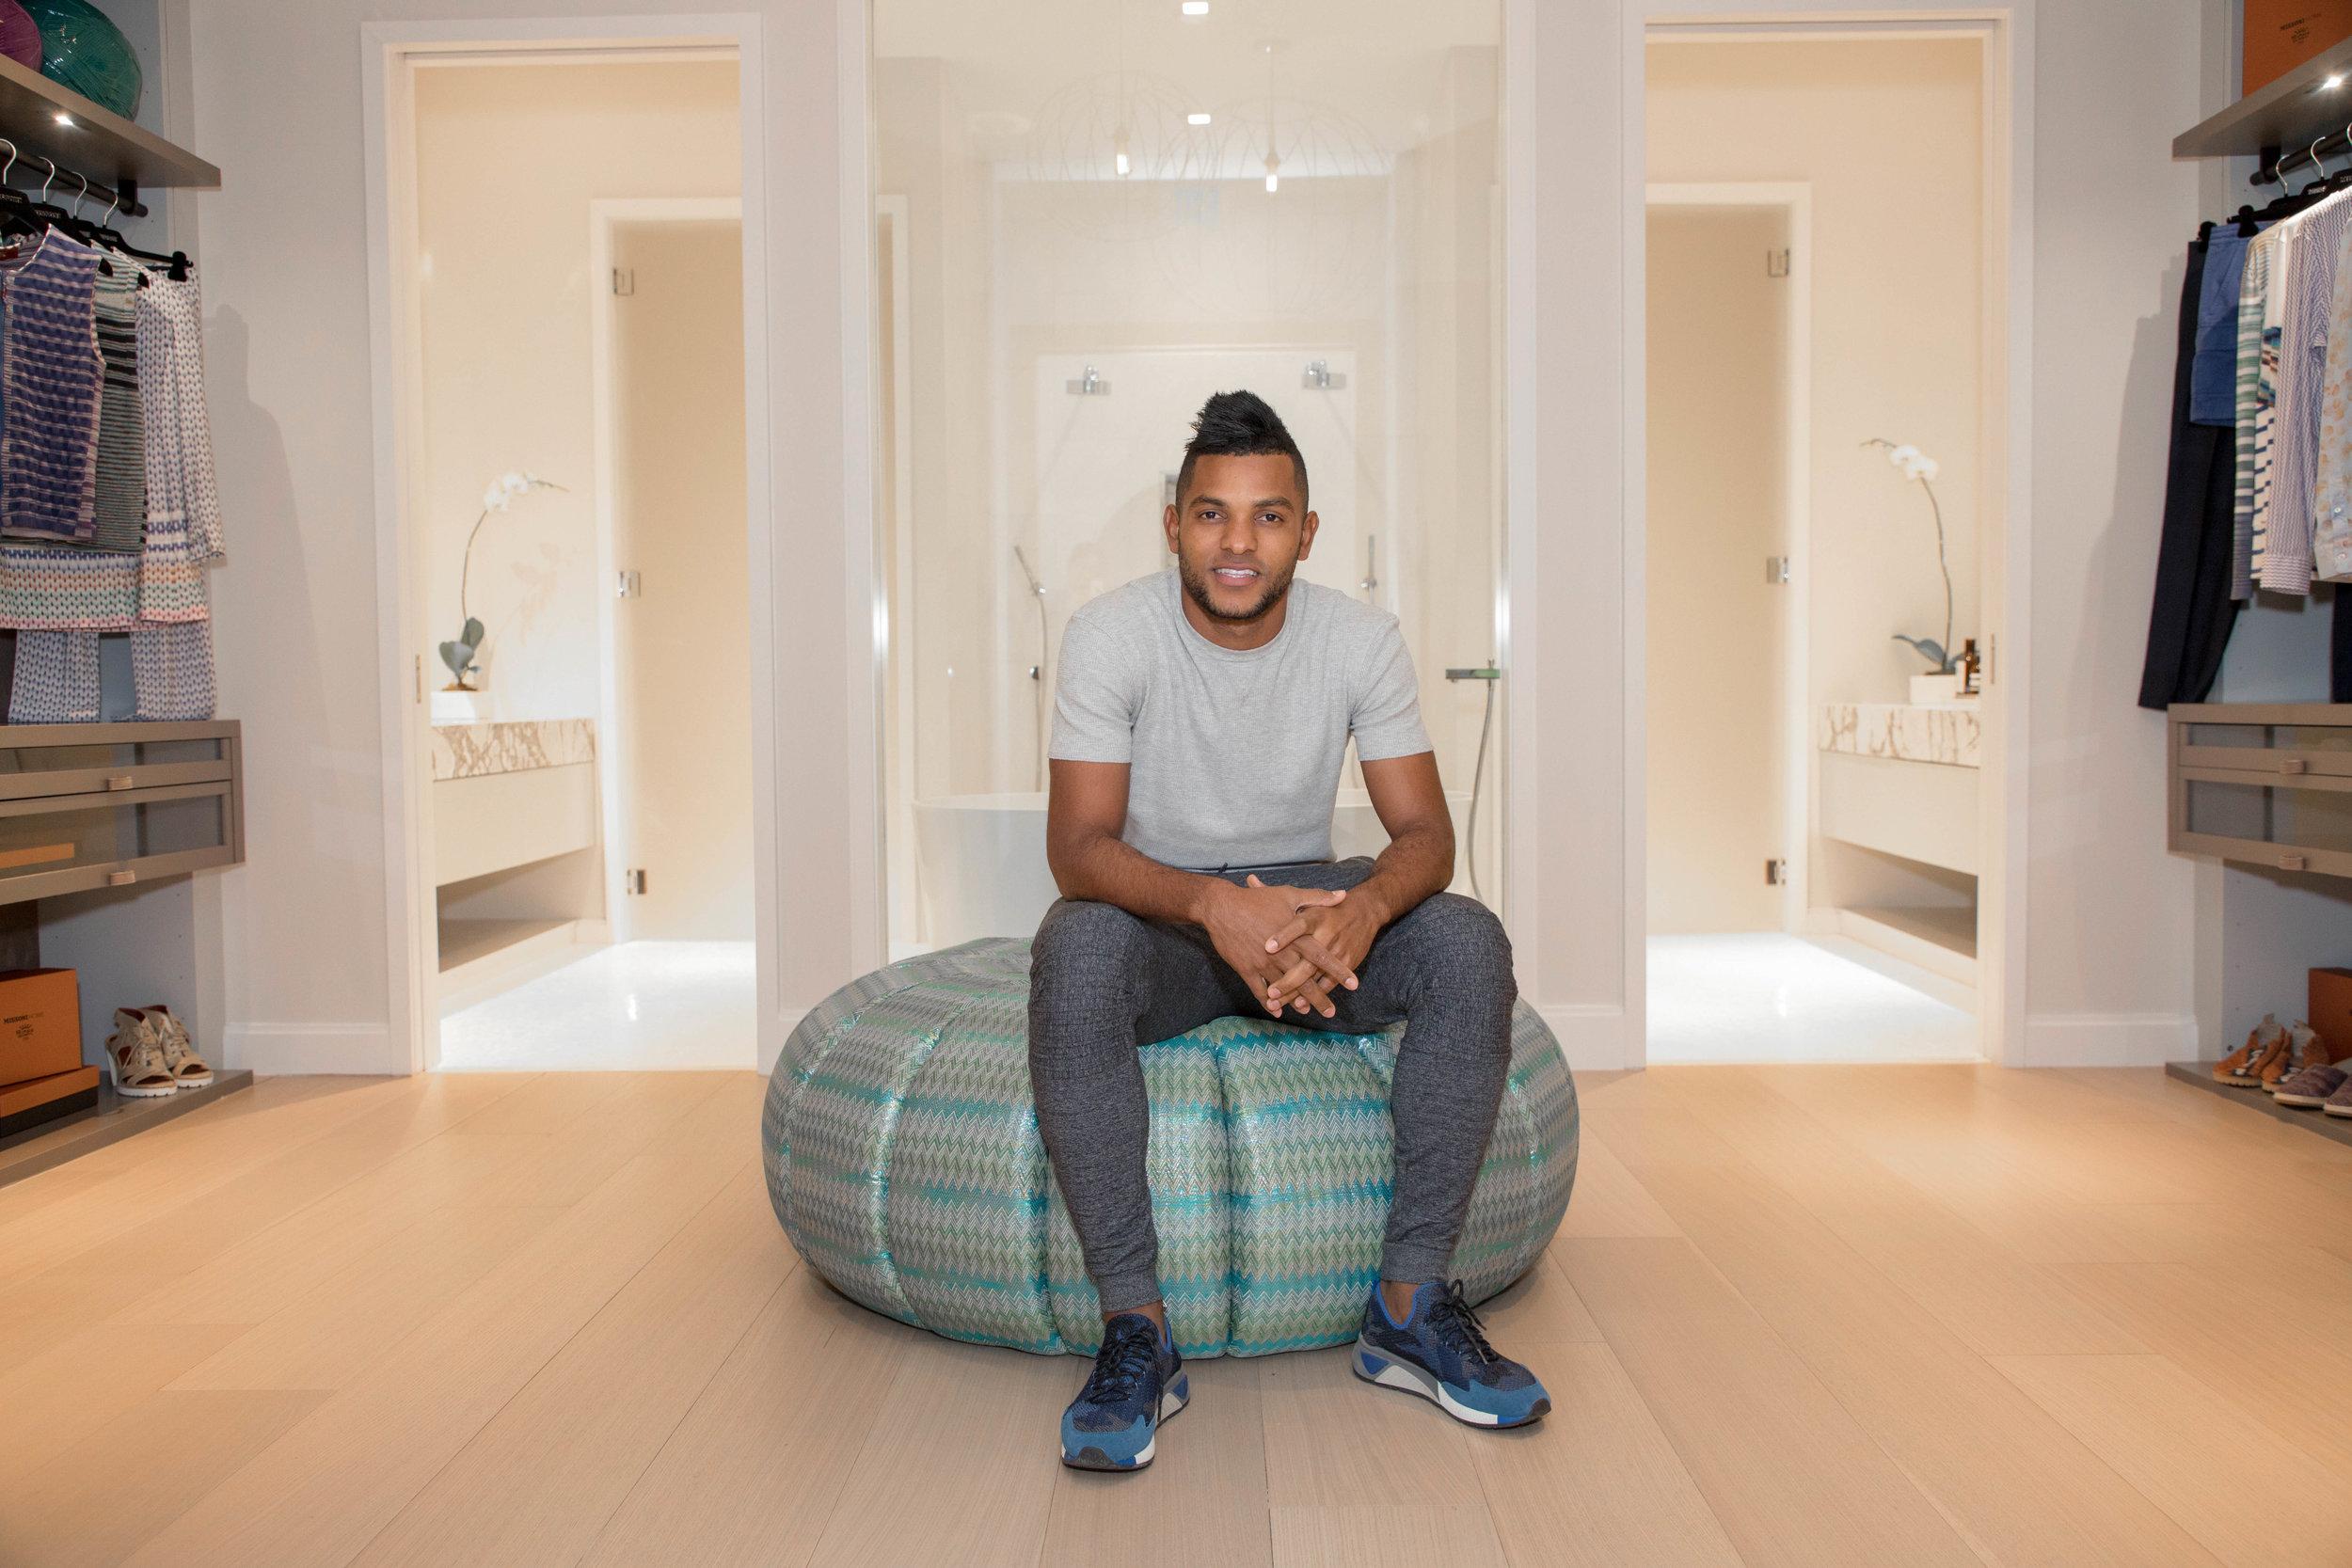 World Cup Soccer Star Miguel Angel Borja Hernandez Purchases Condo In Missoni Baia